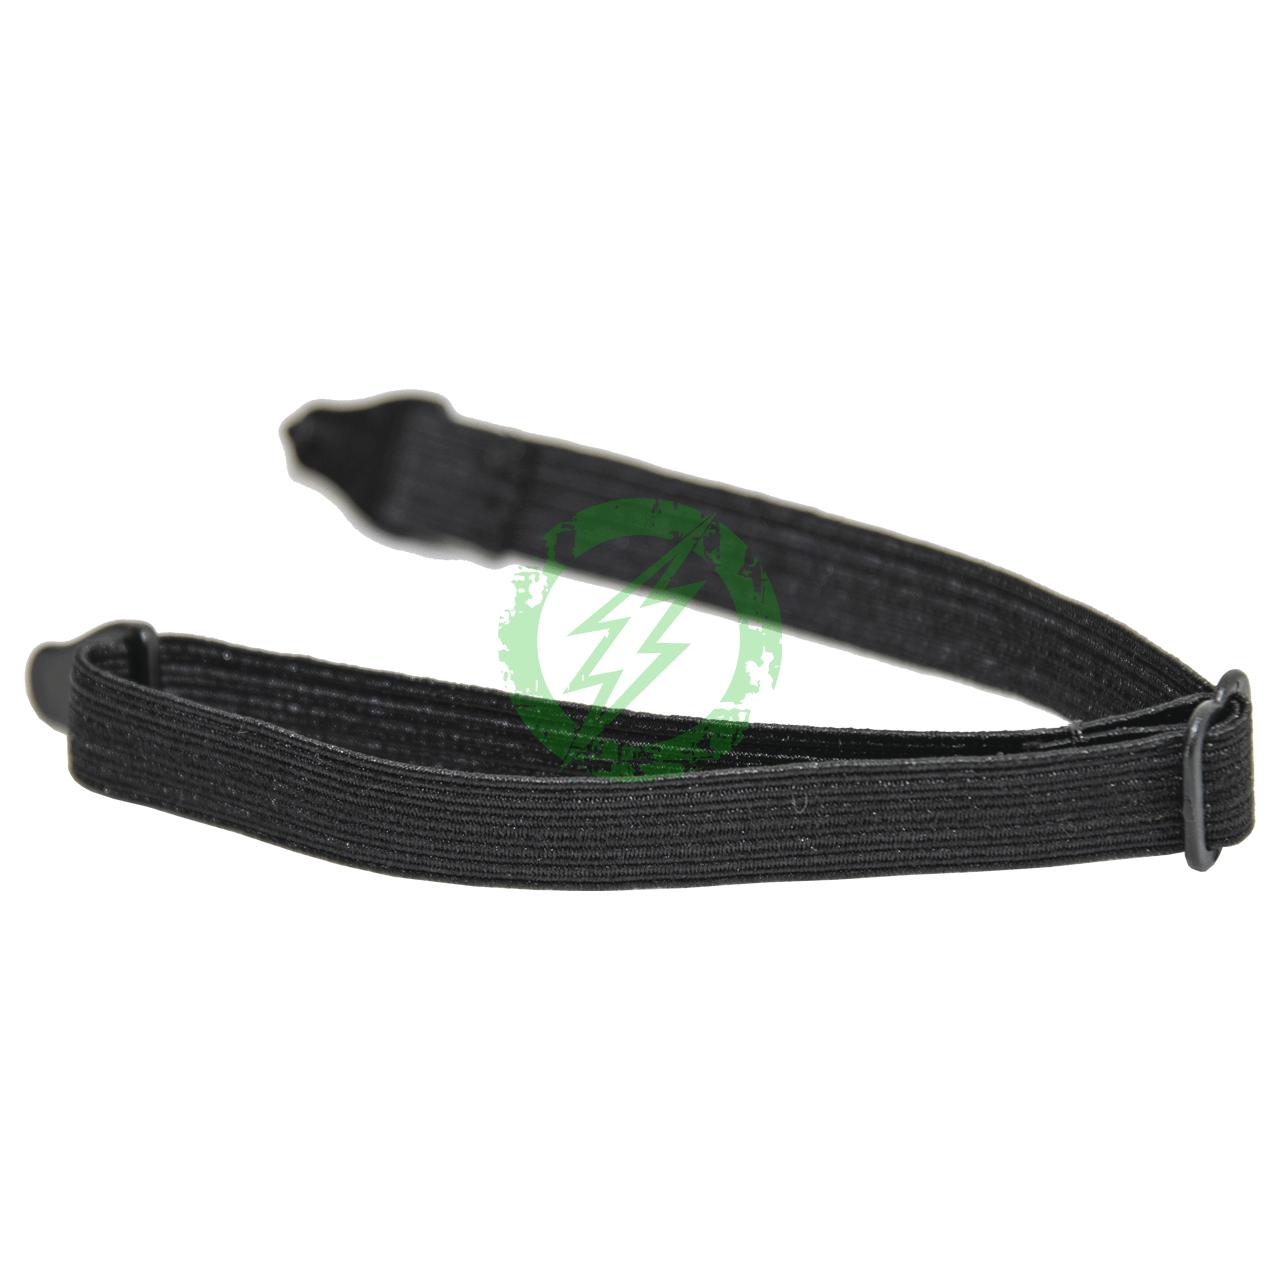 ESS | Crossbow Elastic Retention Straps | Black